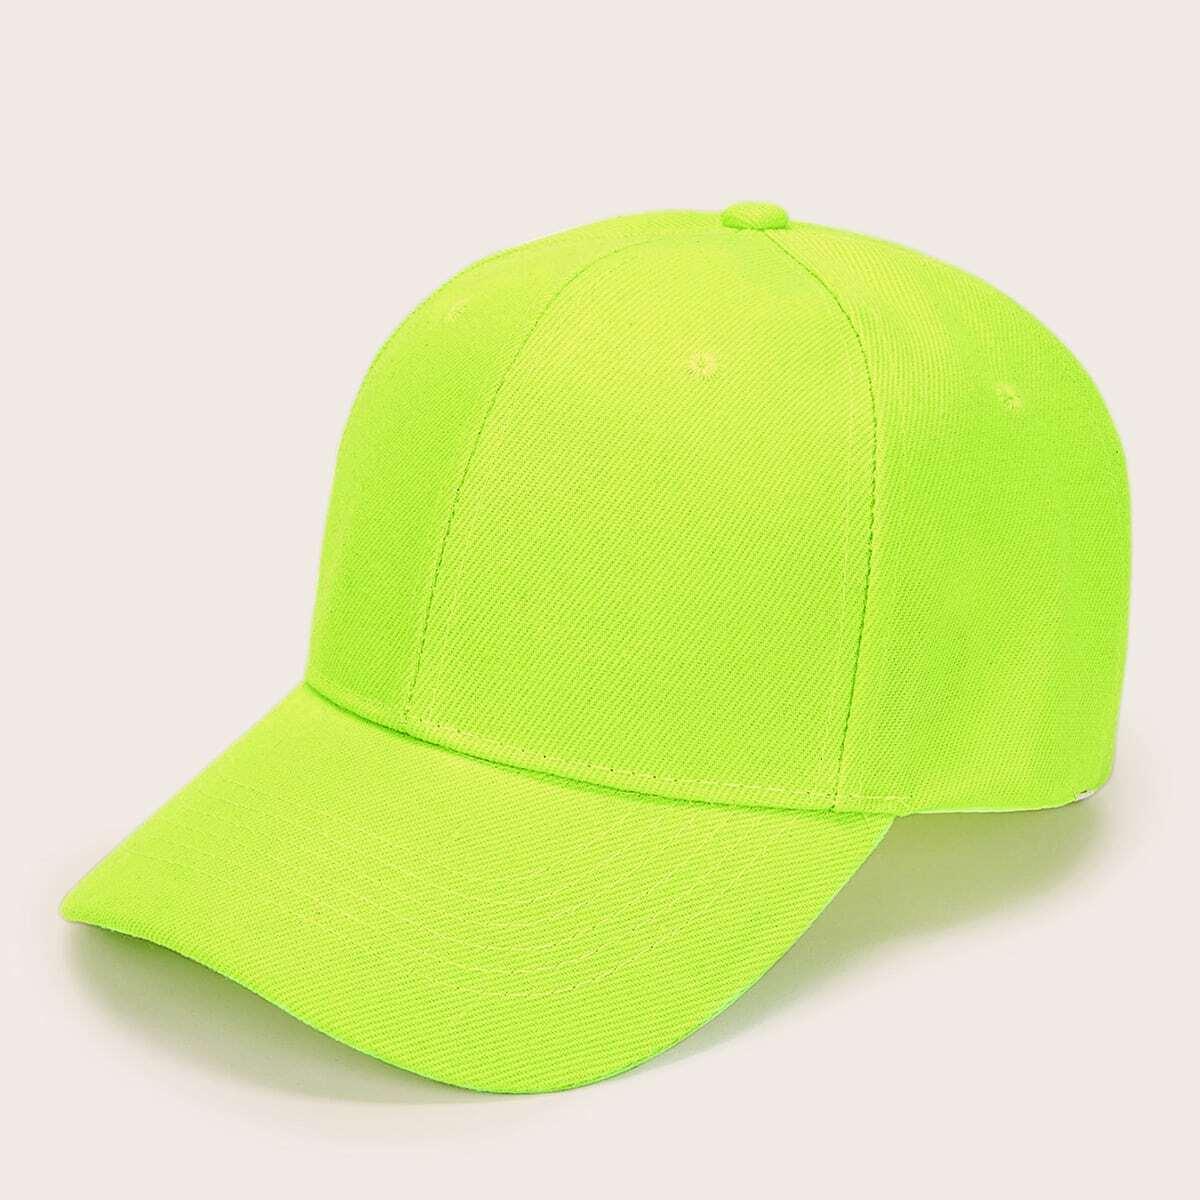 Мужская неоновая зеленая бейсболка от SHEIN